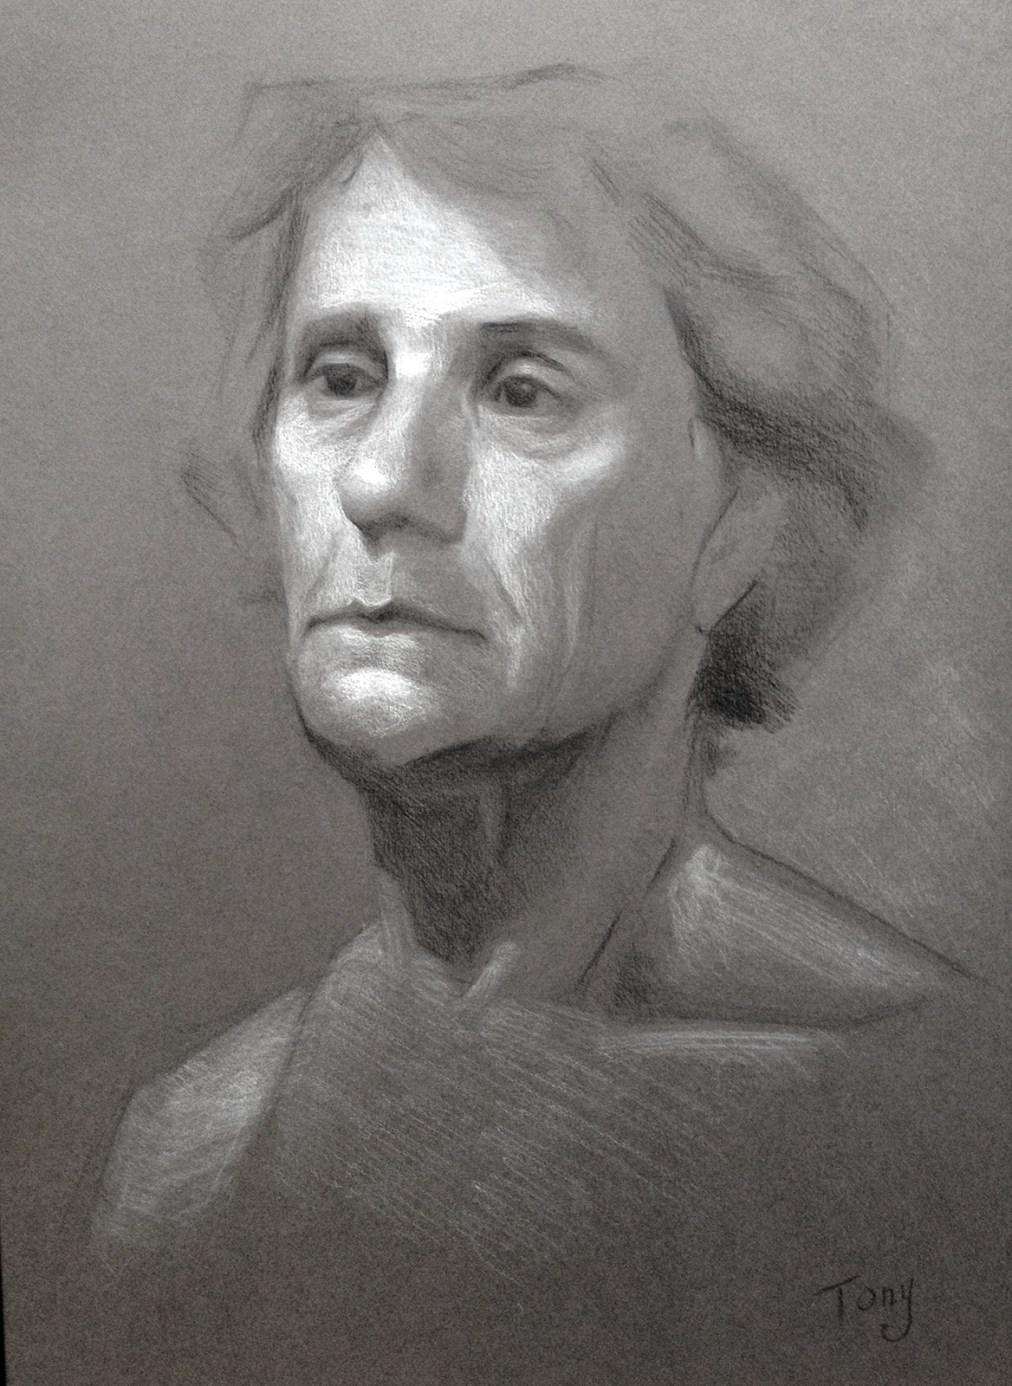 Tony by Tatyana Deniz, charcoal and chalk on paper, 2014